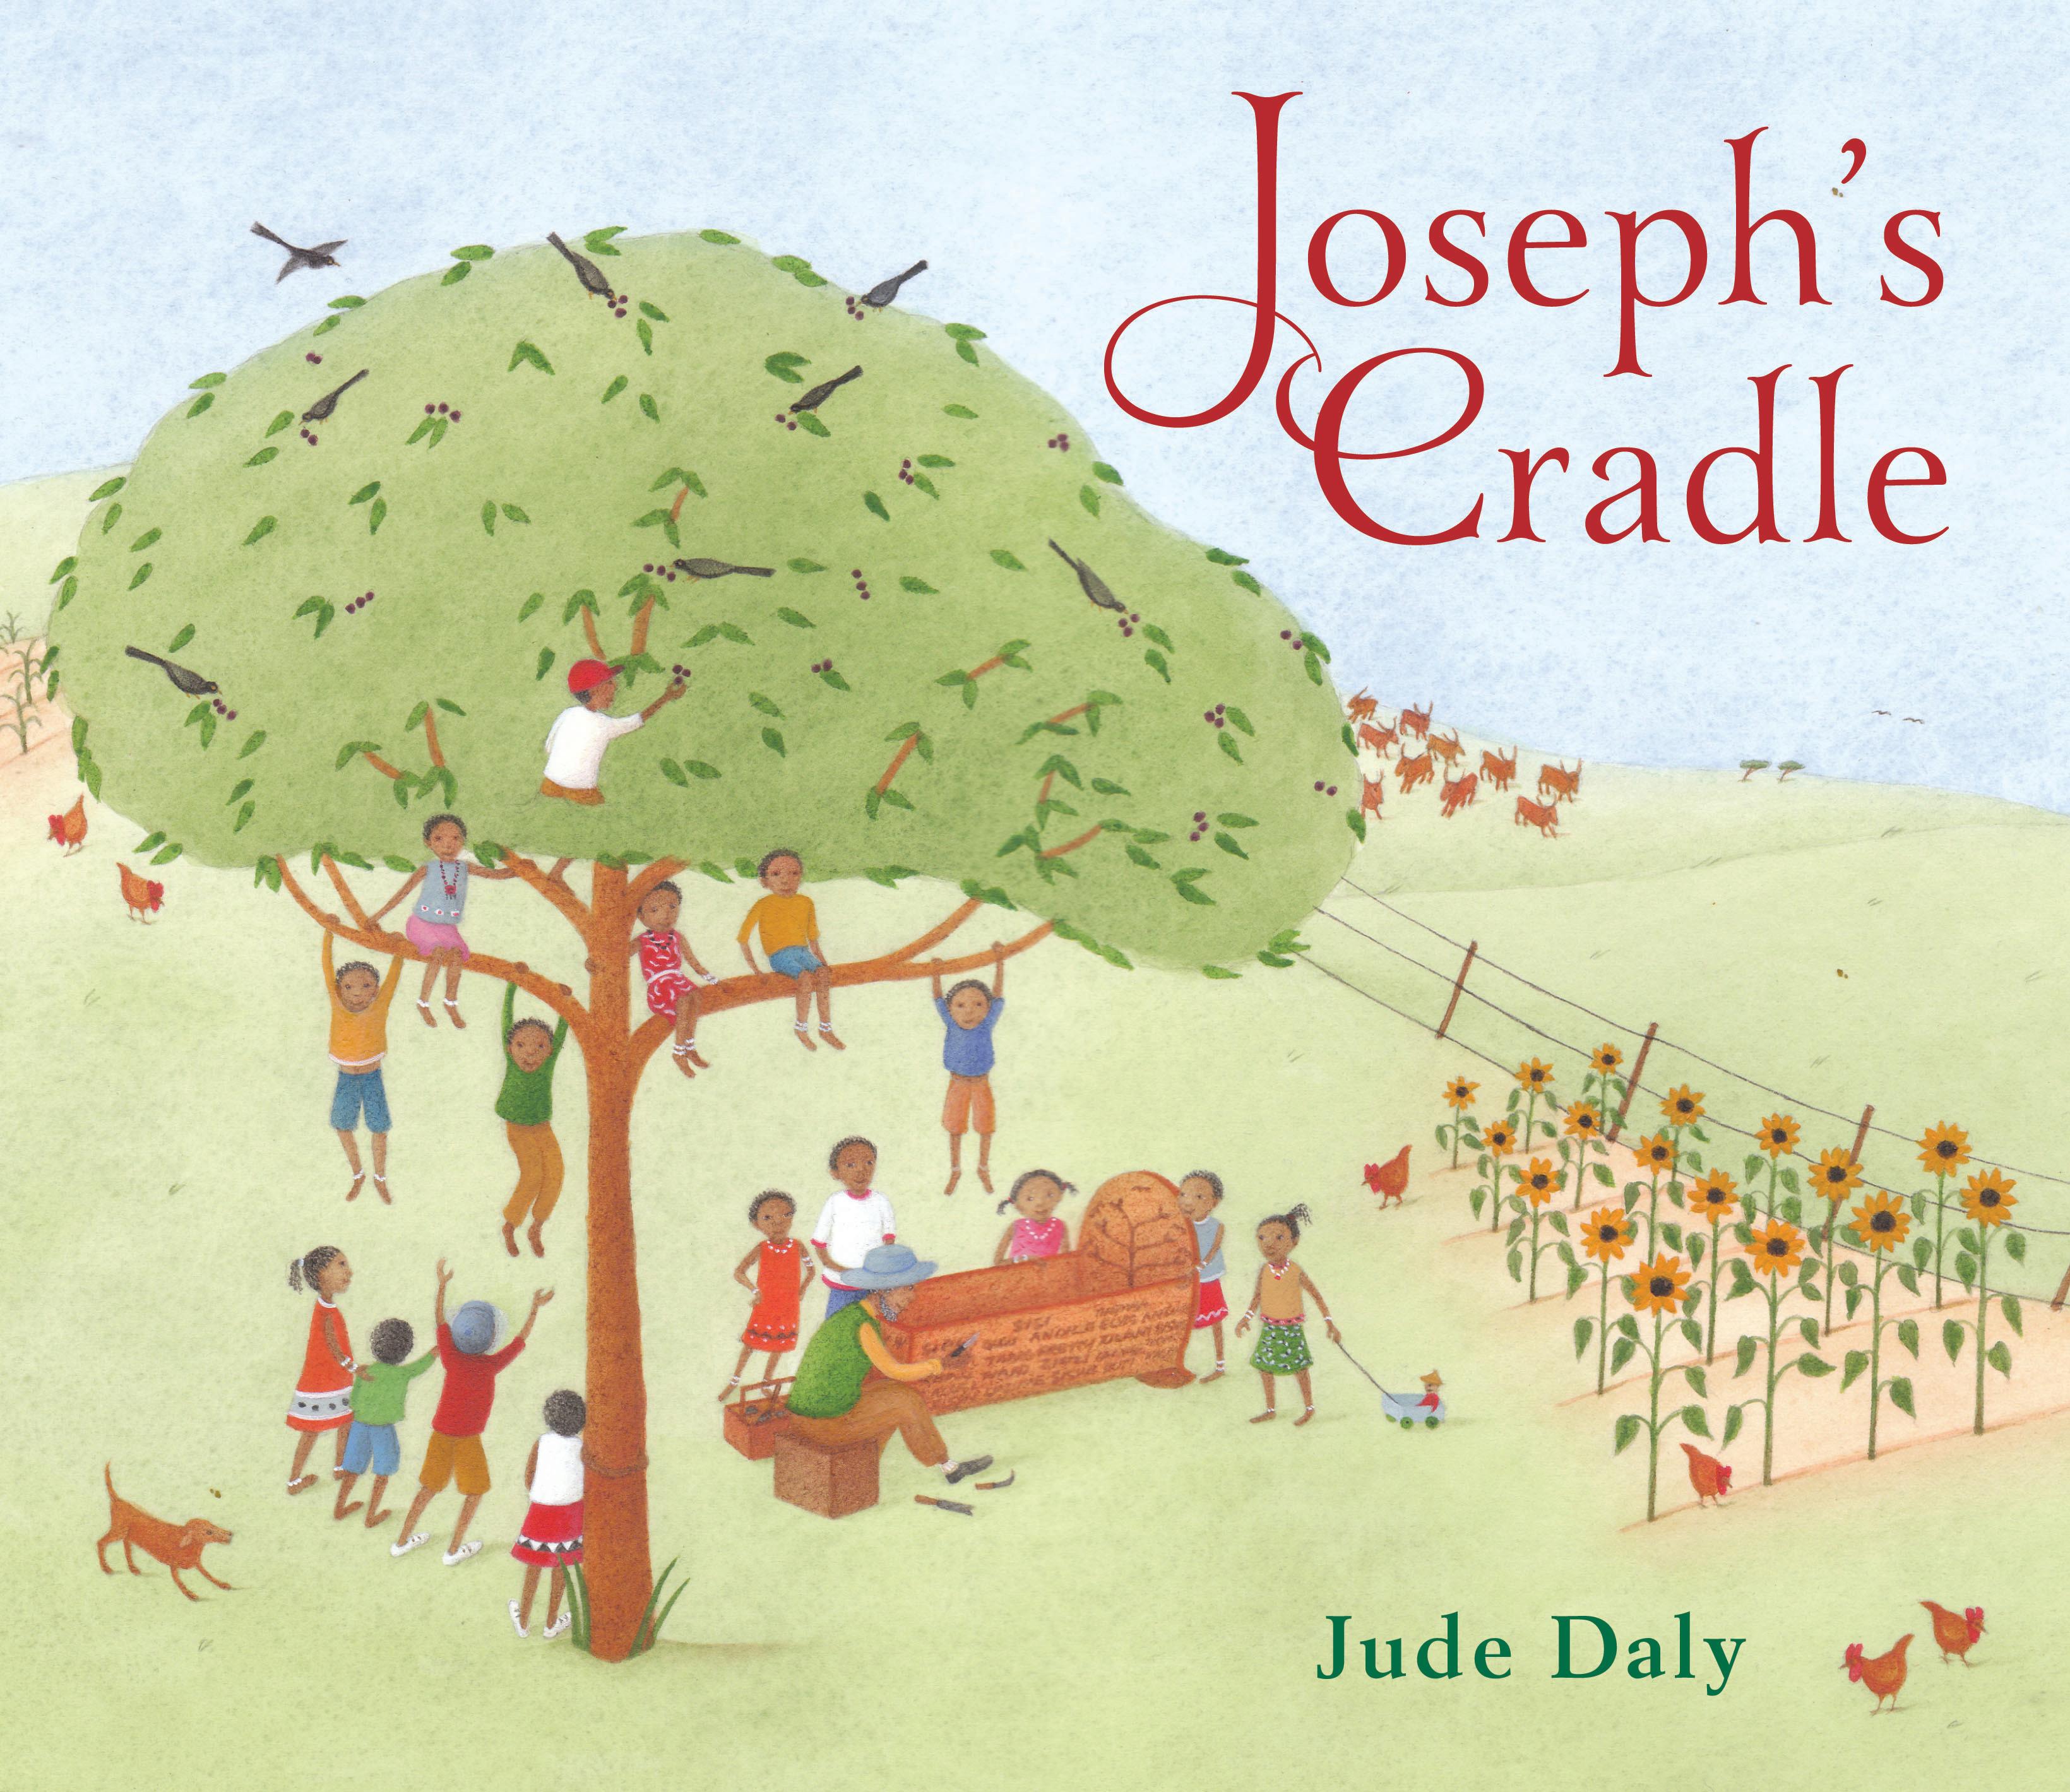 Joseph's Cradle